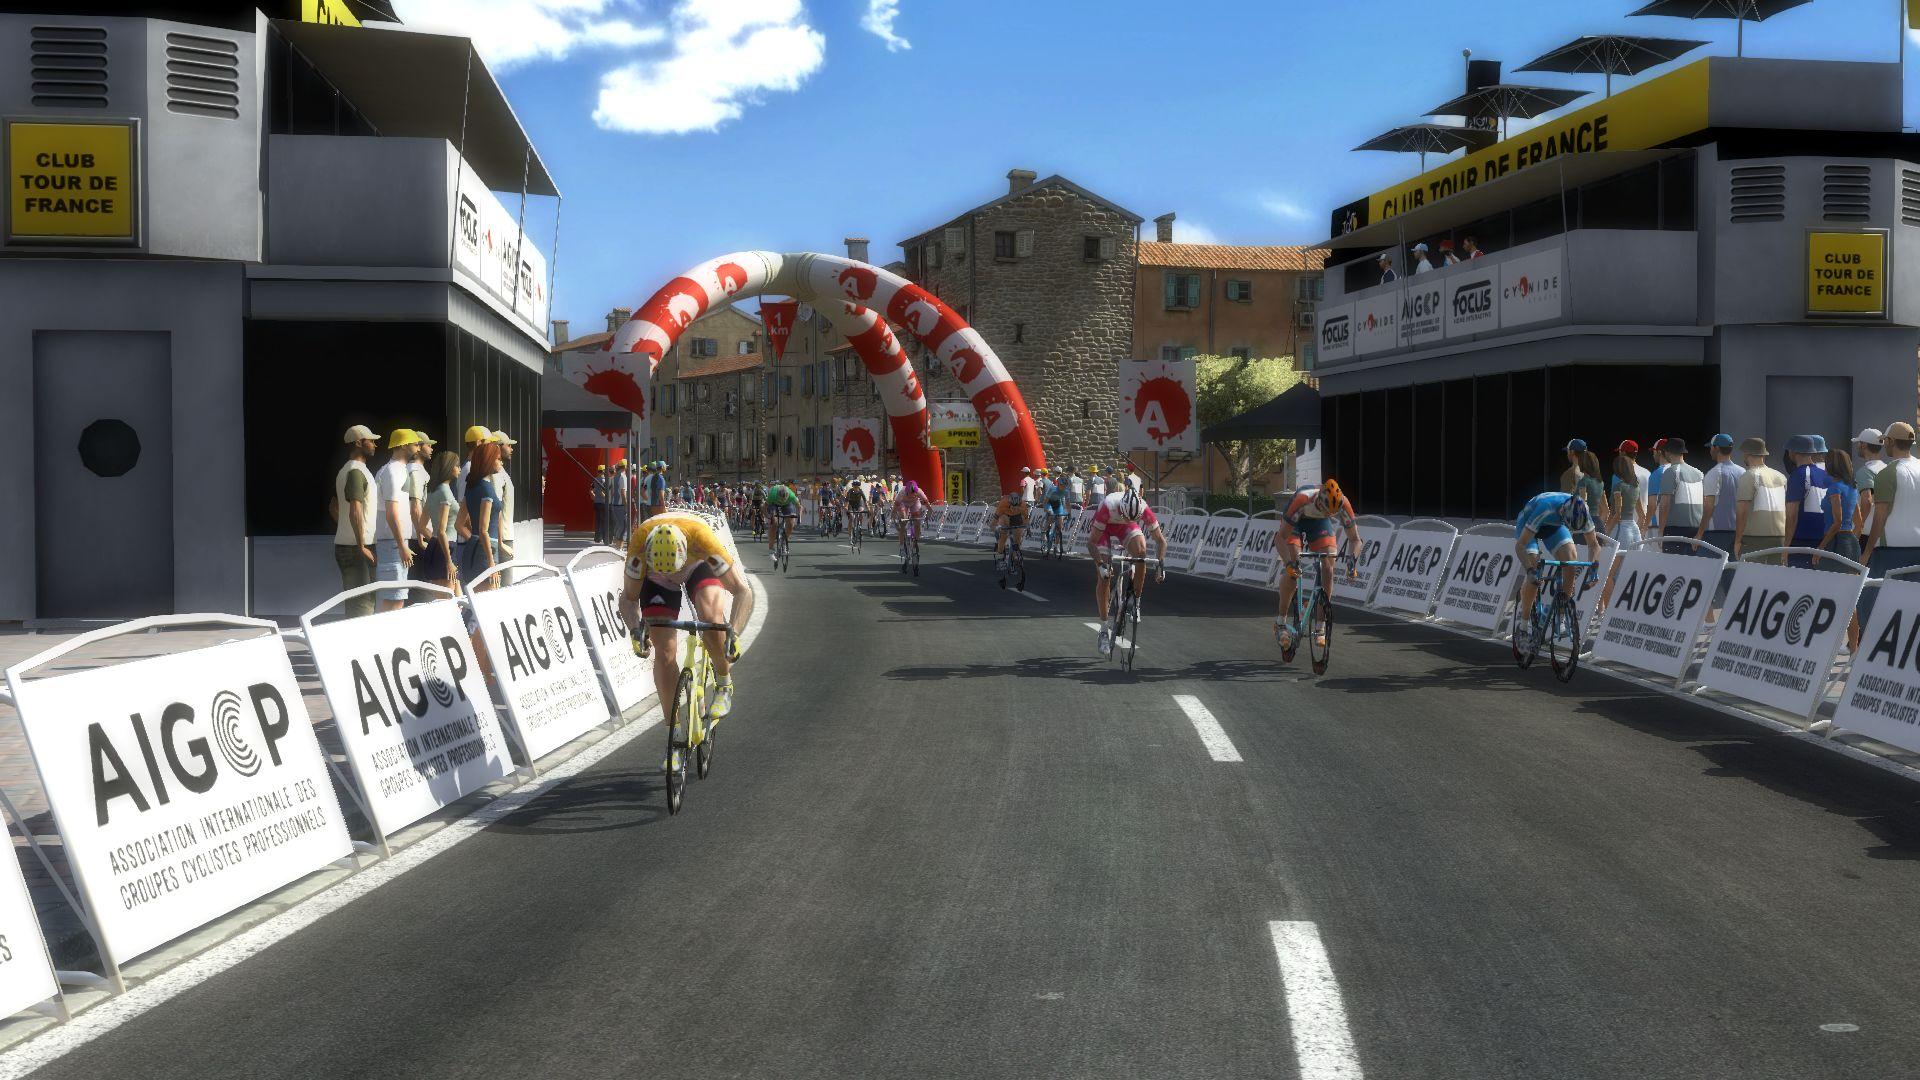 pcmdaily.com/images/mg/2019/Races/PT/Tirreno/mg19_ta_s07_22.jpg